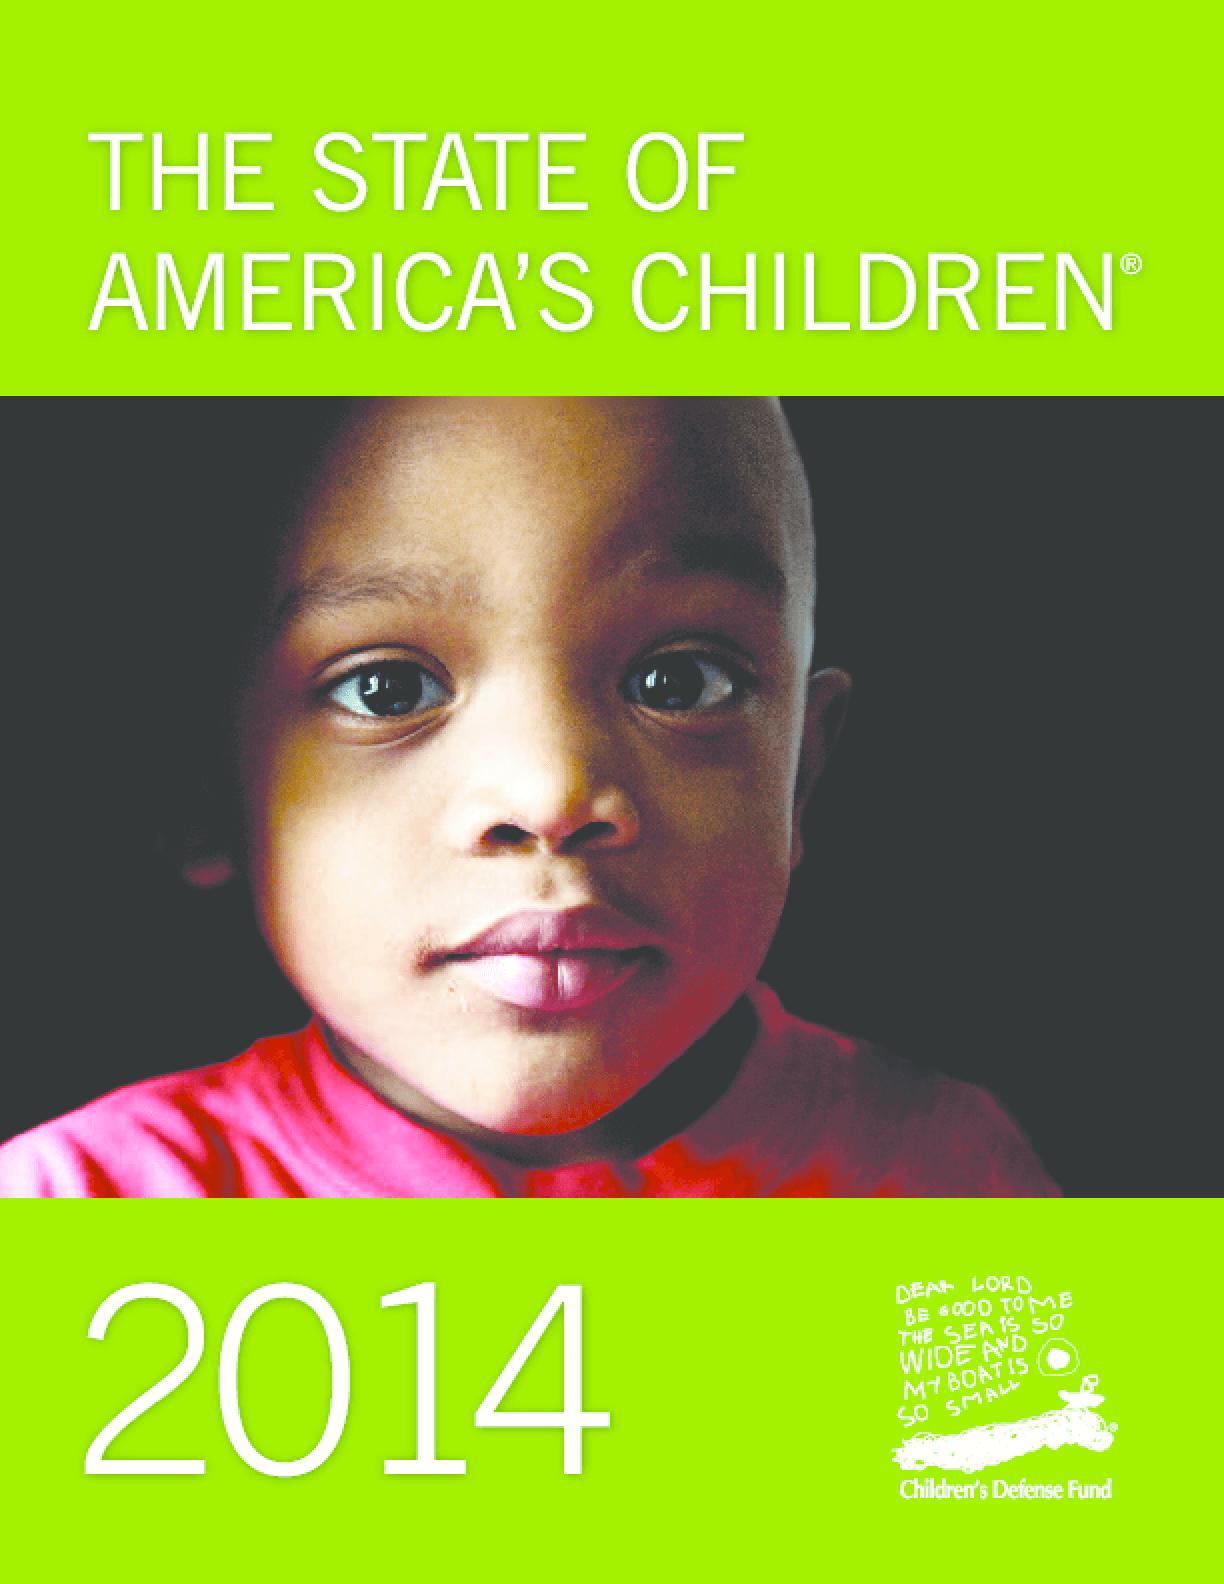 The State of America's Children: 2014